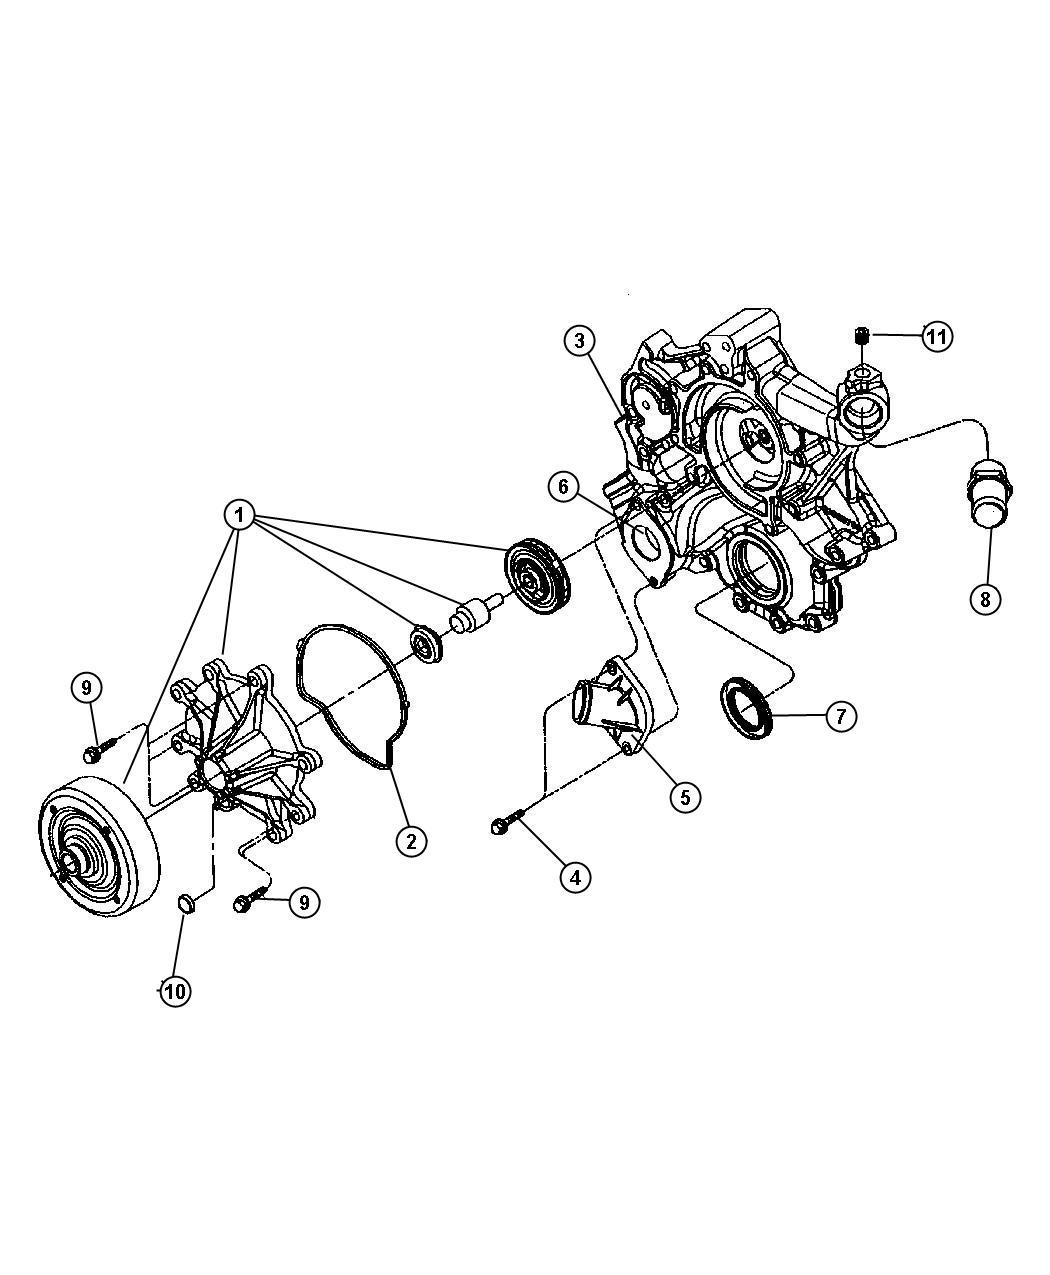 2006 jeep commander heater hose diagram